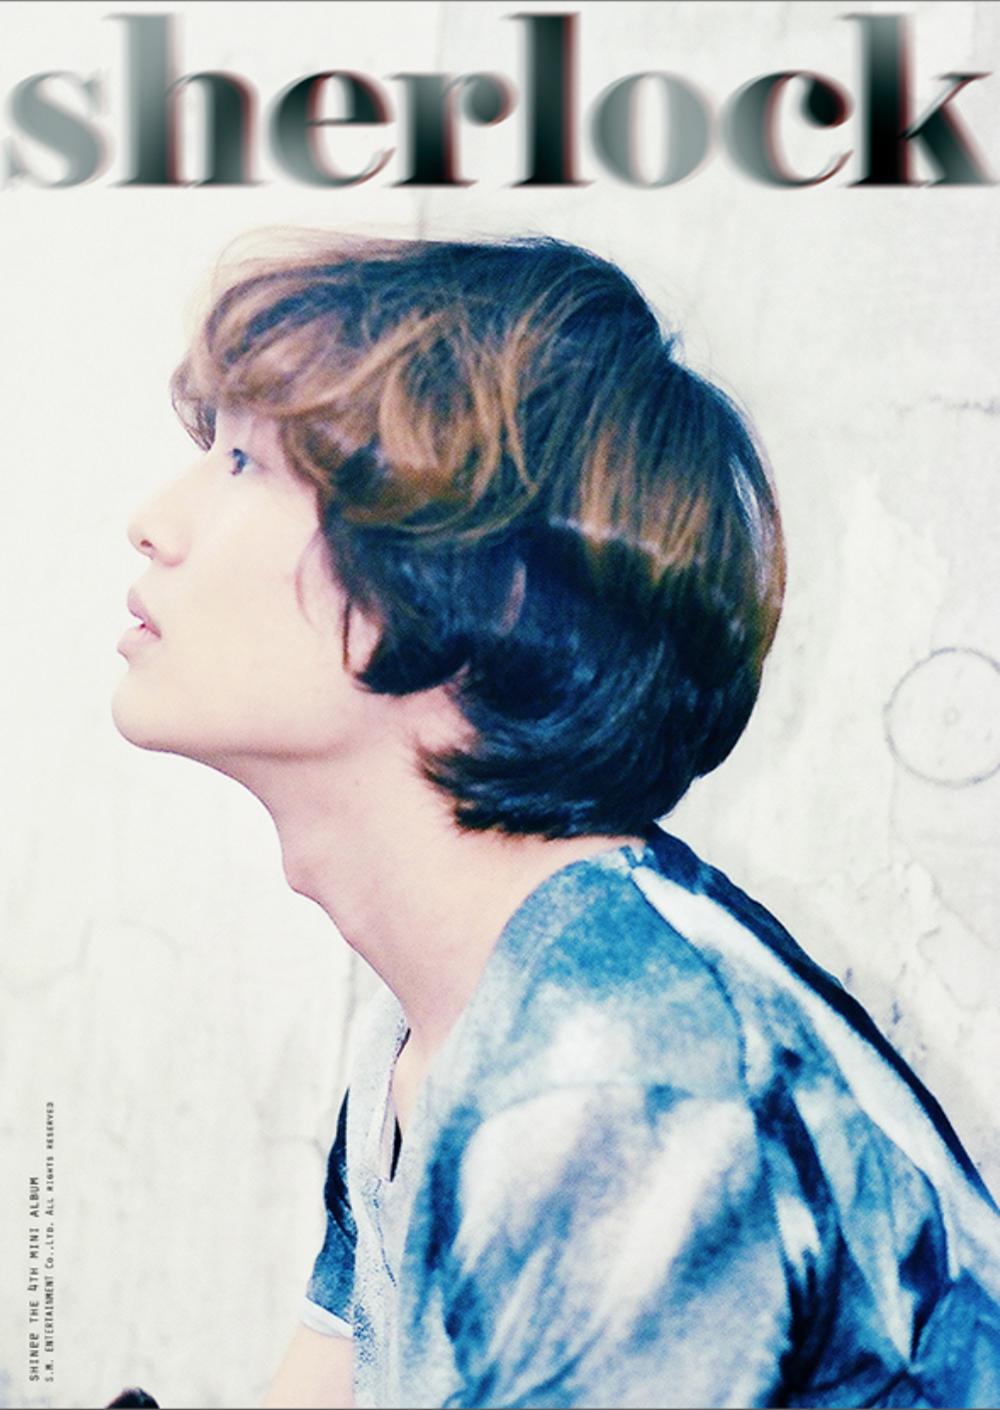 SHINee - Sherlock (Onew).png